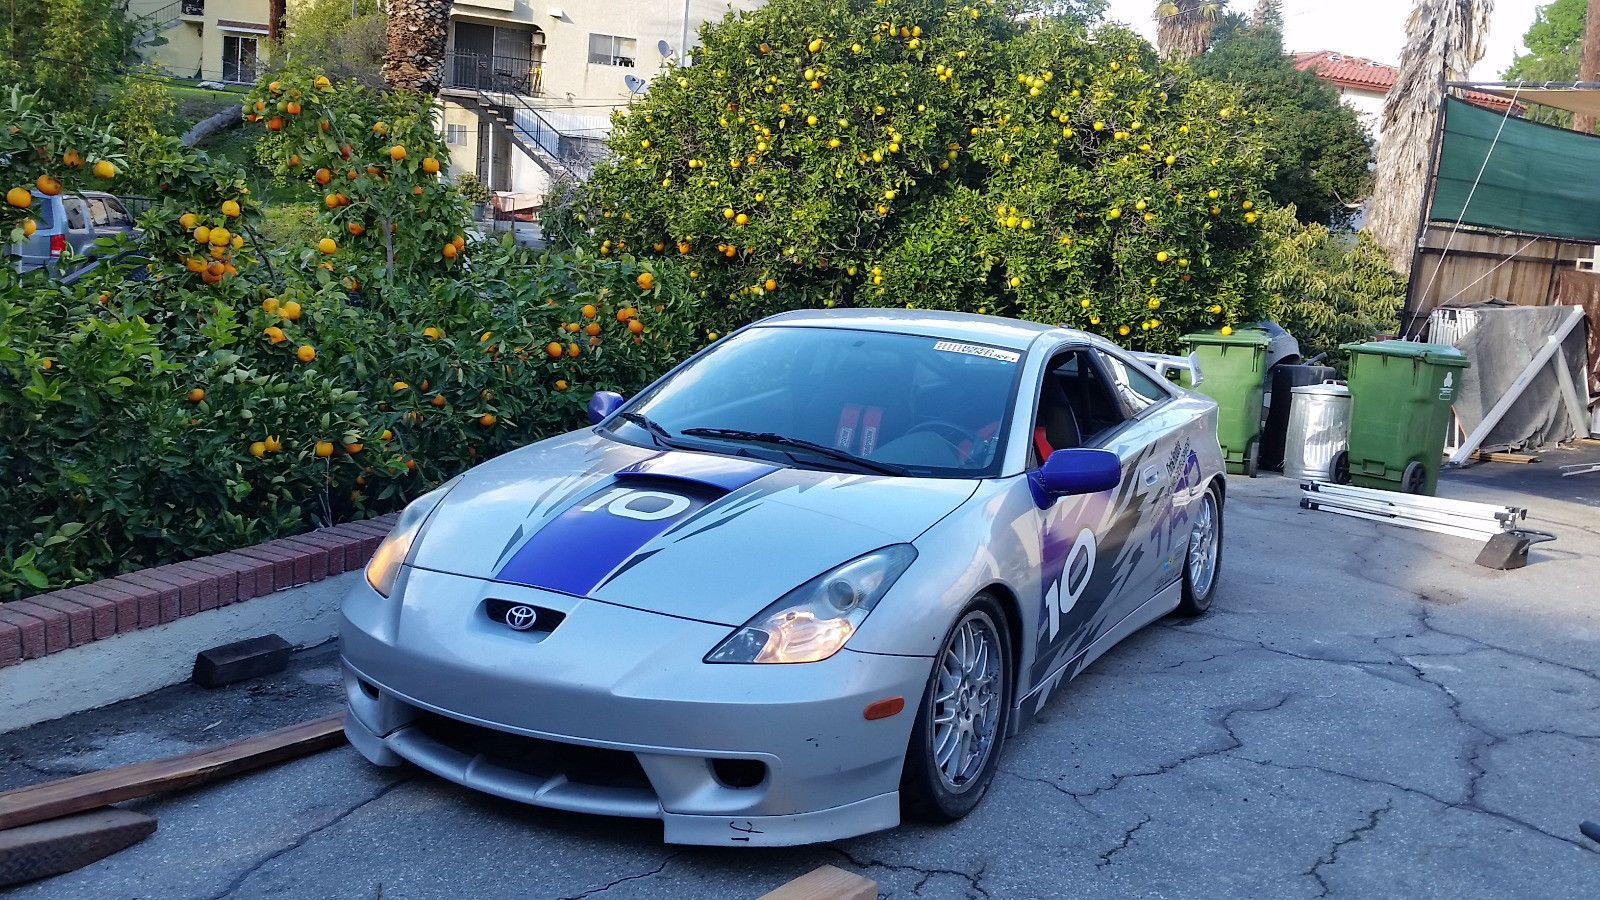 Toyota Celica – Original condition | Race cars for sale | Pinterest ...